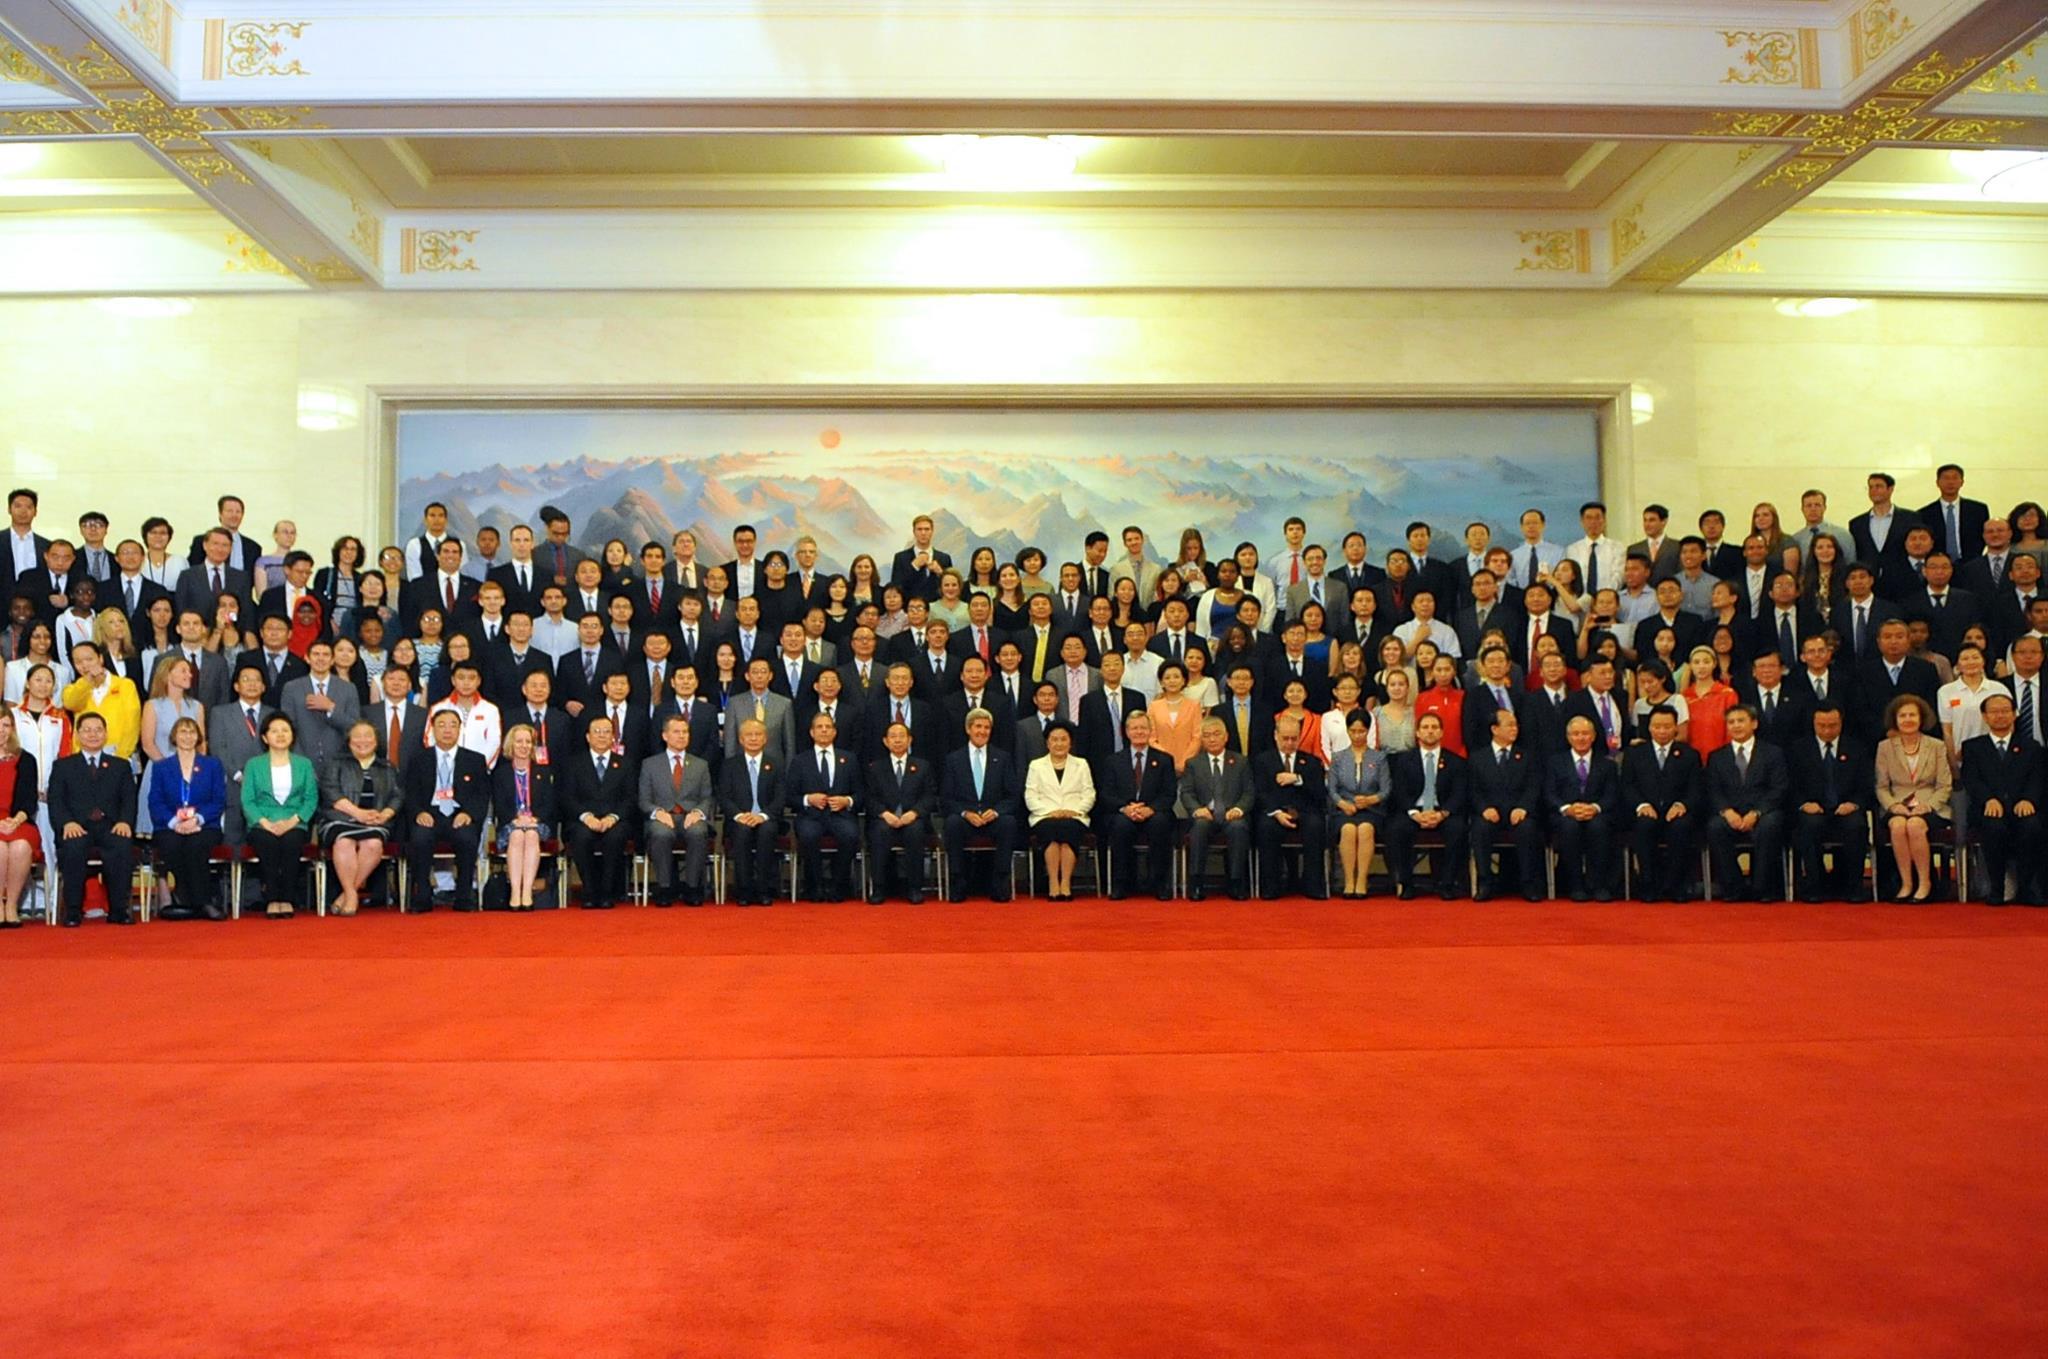 Group photo with Secretary of State John Kerry and Vice Premier Madam Liu Yandong